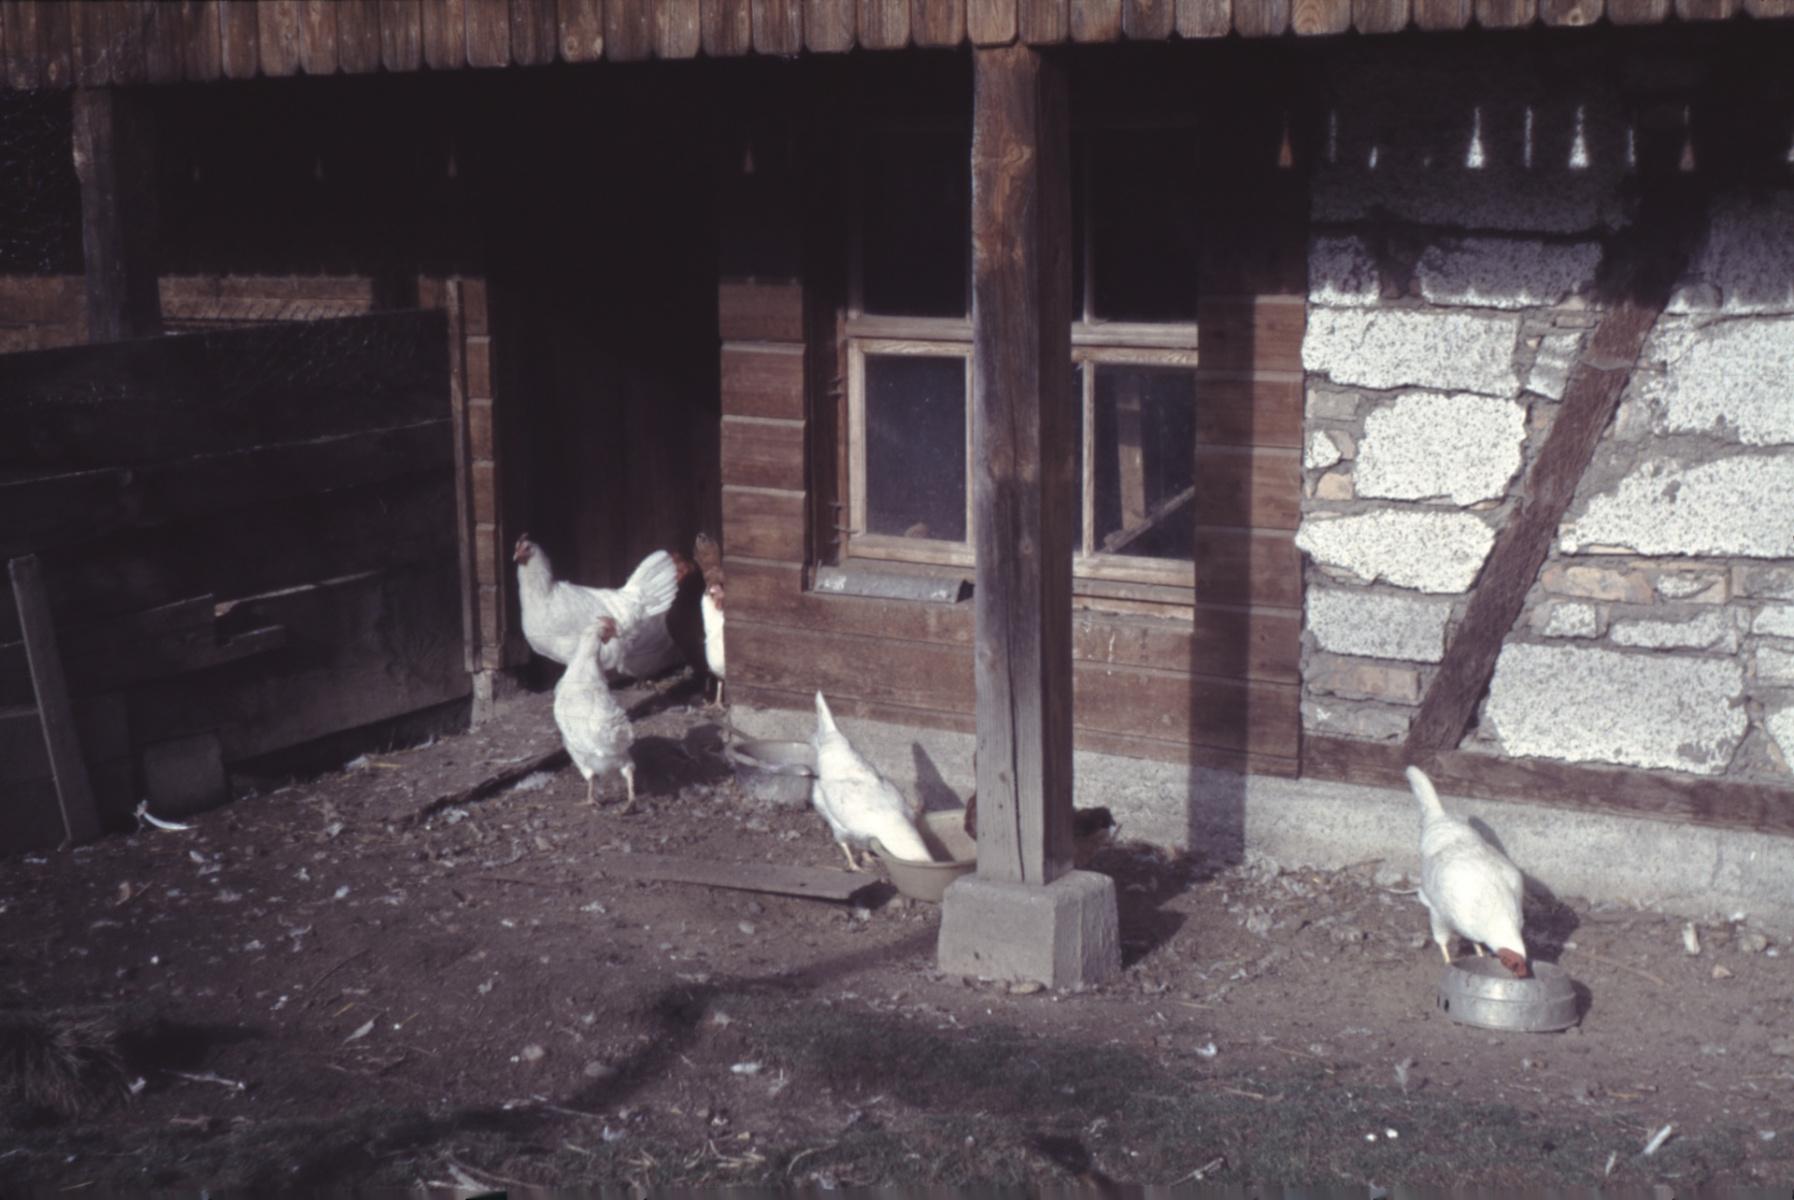 Schneebeli's Hühner